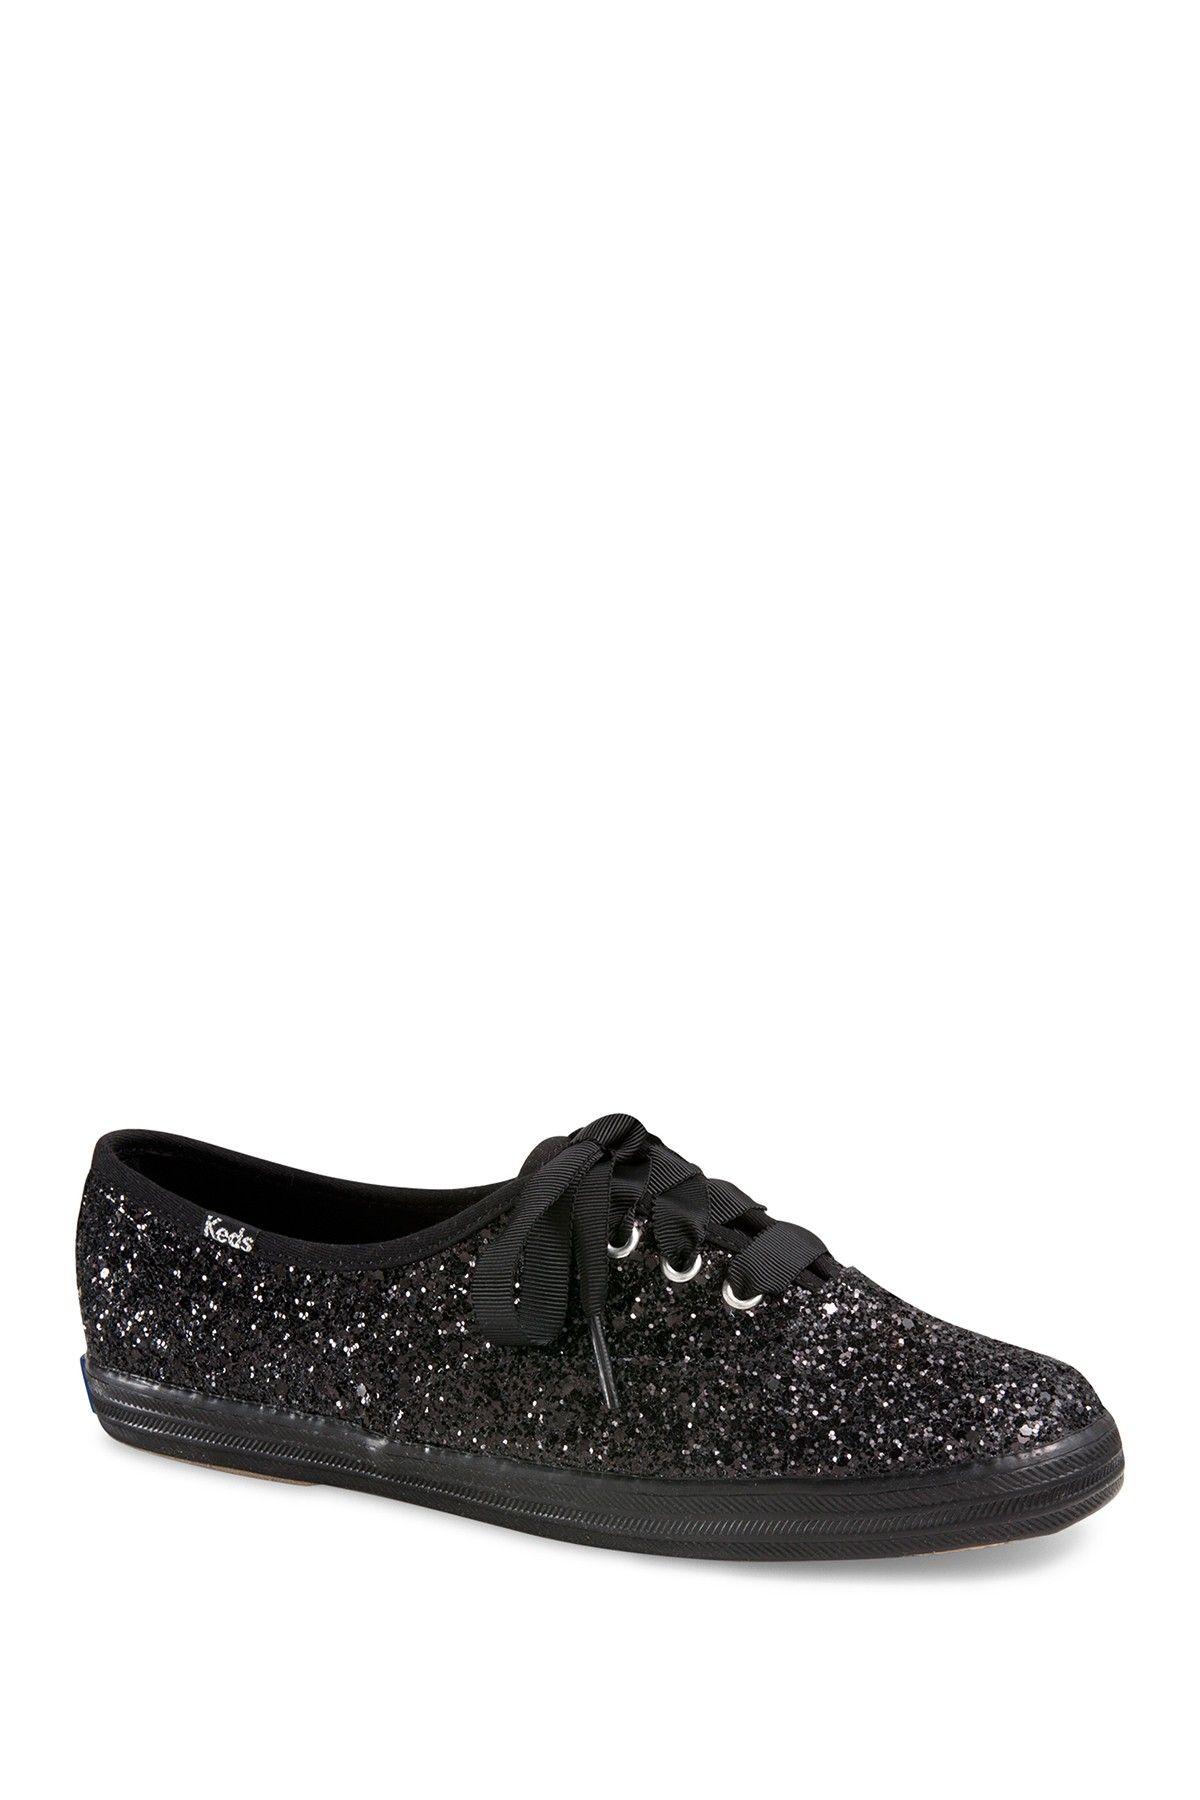 f85739649c3 Black Glitter Keds.